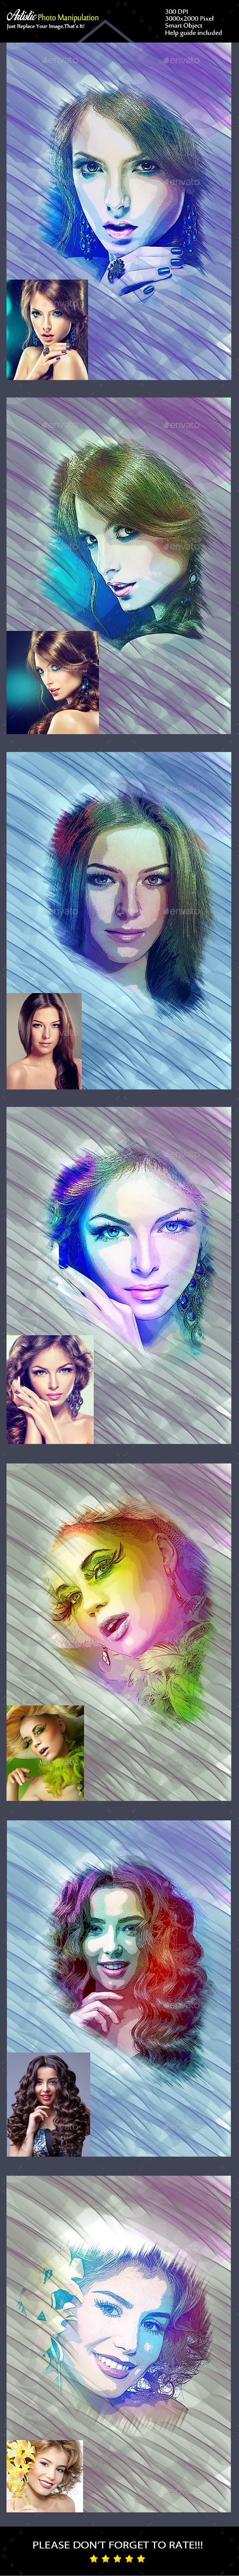 Artistic Photo Templates - Photo Templates Graphics